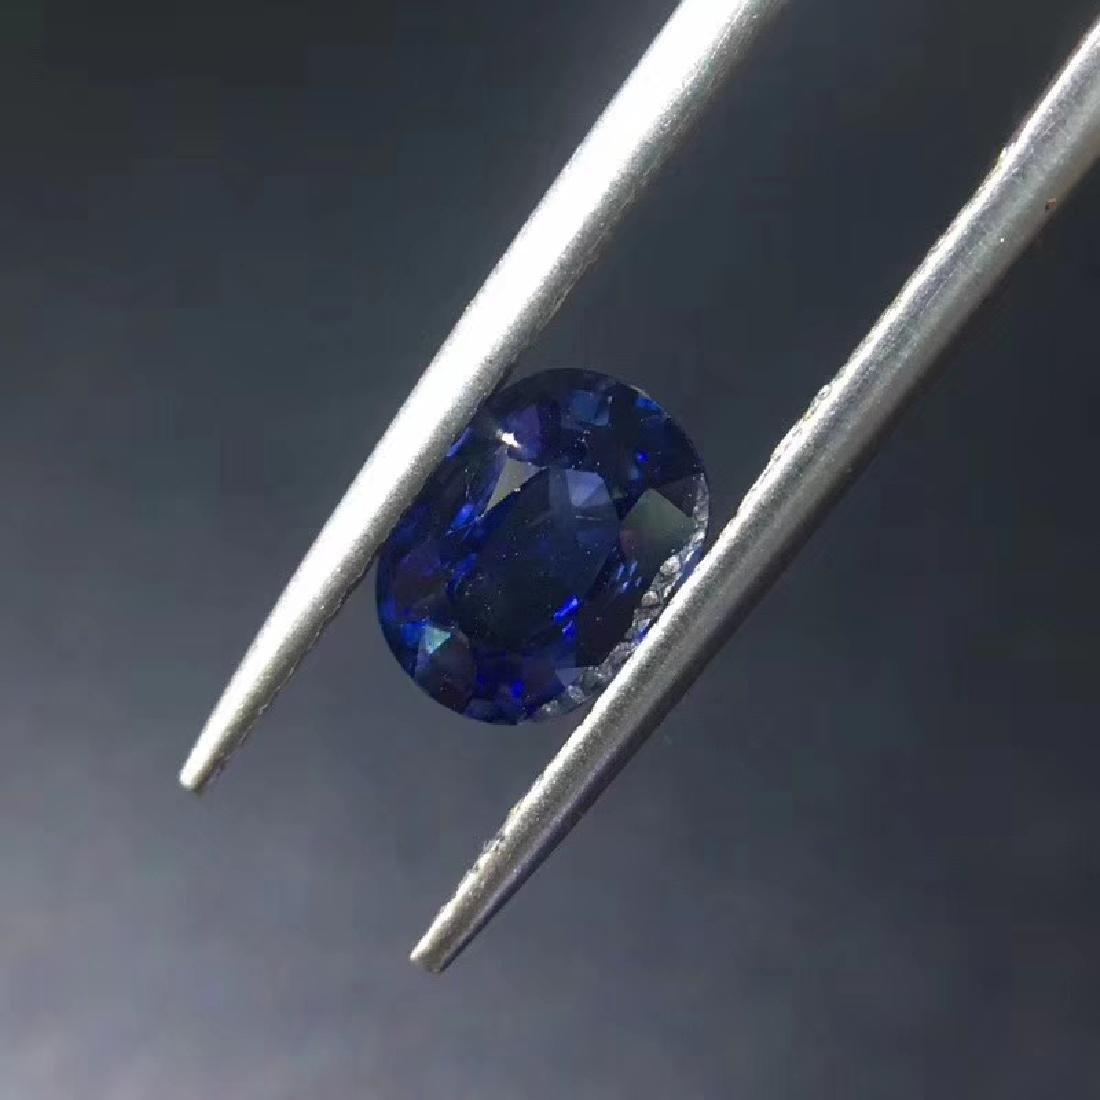 1.38 ct Sapphire 5.5*7.4*3.5 mm Oval Cut - 3